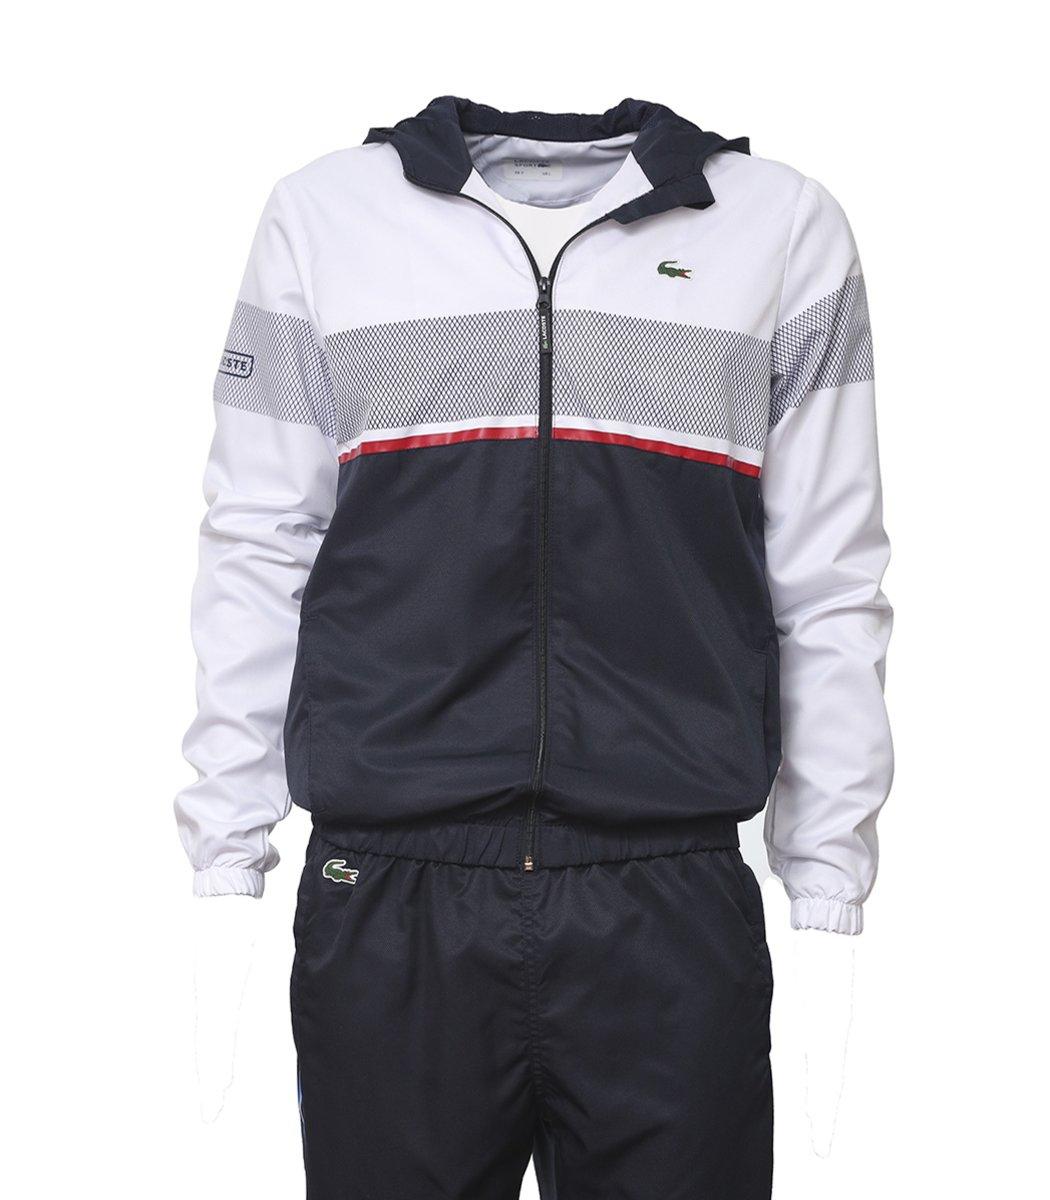 ca811aaab5b1 Купить - Бело-синий спортивный костюм с капюшоном Lacoste-6Lac1 ...